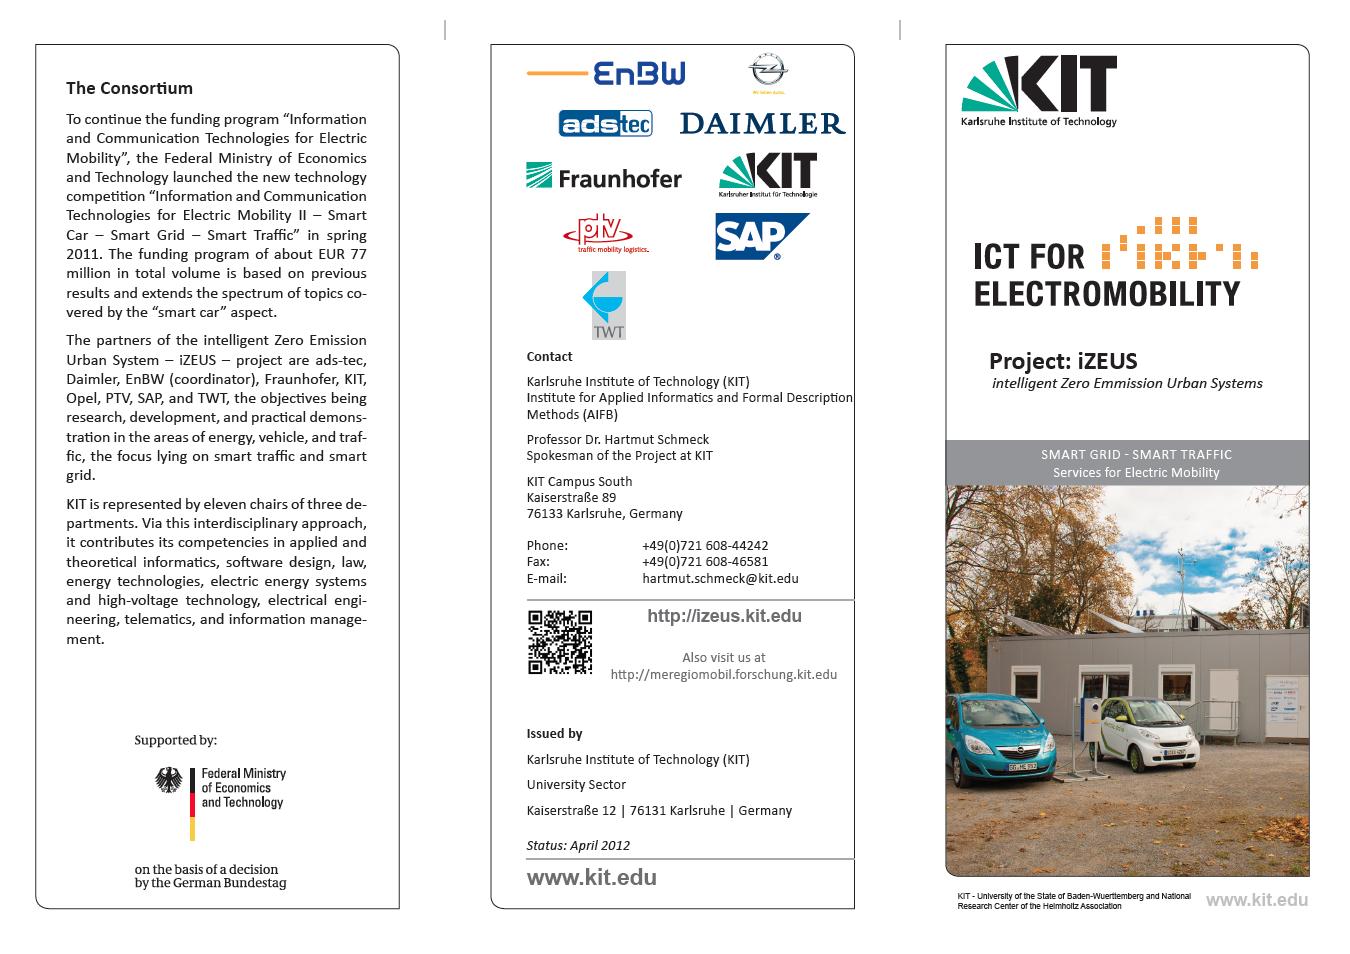 KIT Research Project iZEUS - iZEUS - intelligent Zero Emission Urban ...